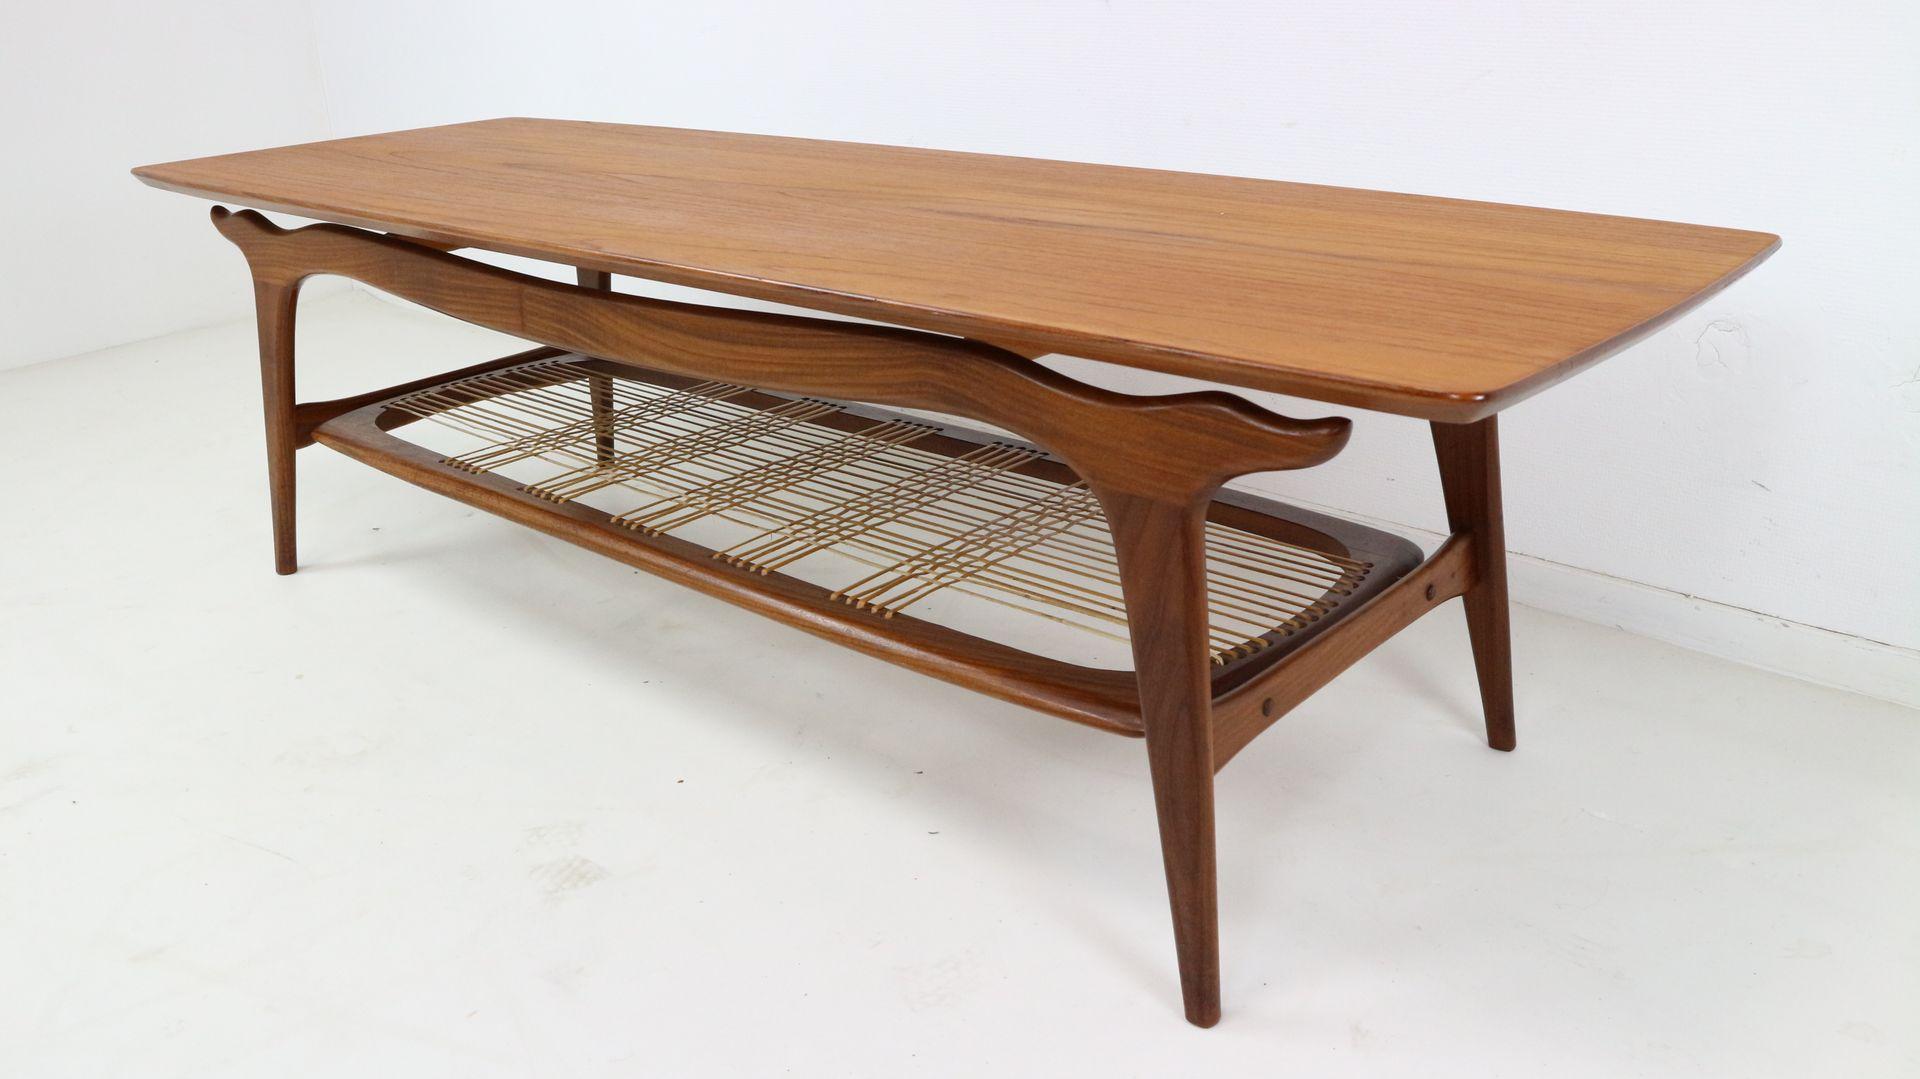 Teak Coffee Table by Louis Van Teeffelen for WéBé 1950s for sale